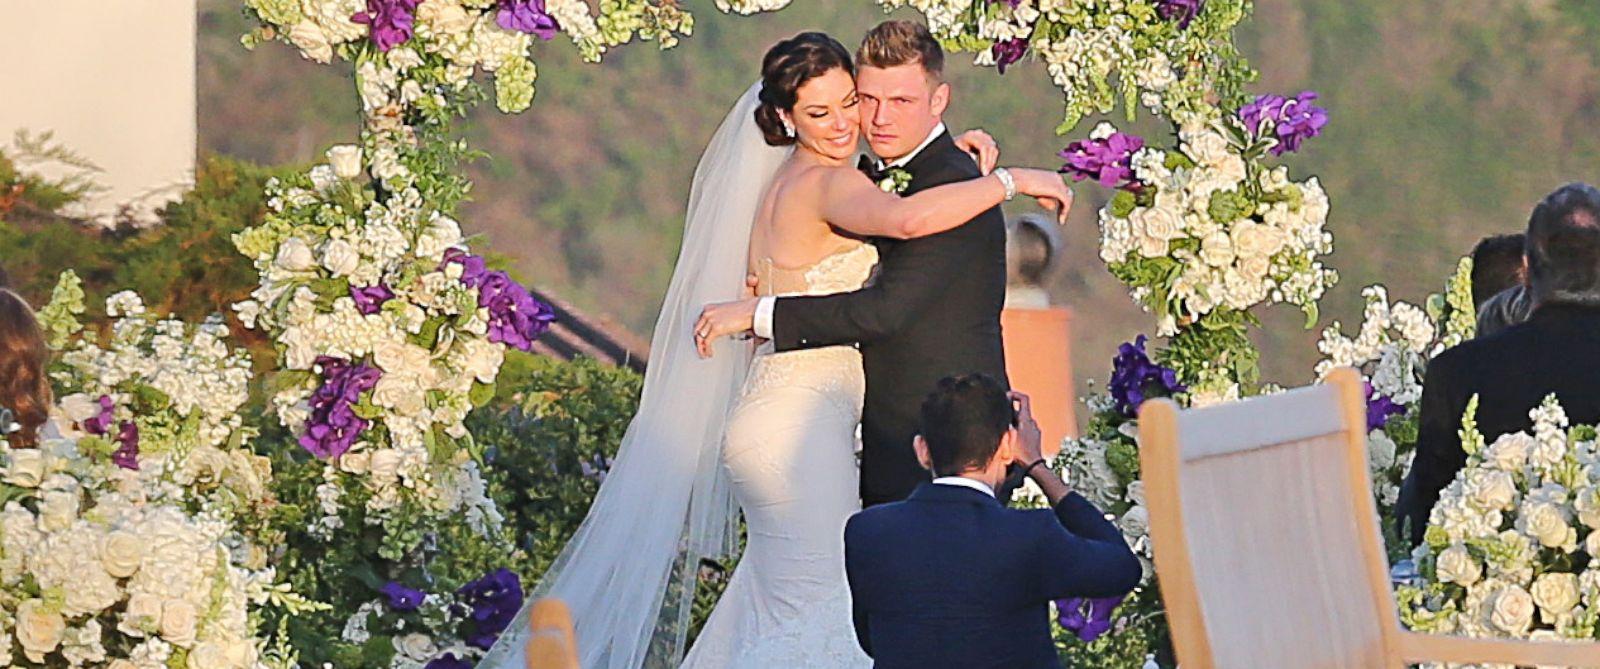 PHOTO: Nick Carter gets married to fiance Lauren Kitt in Santa Barbara, Calif, on April 12, 2014.